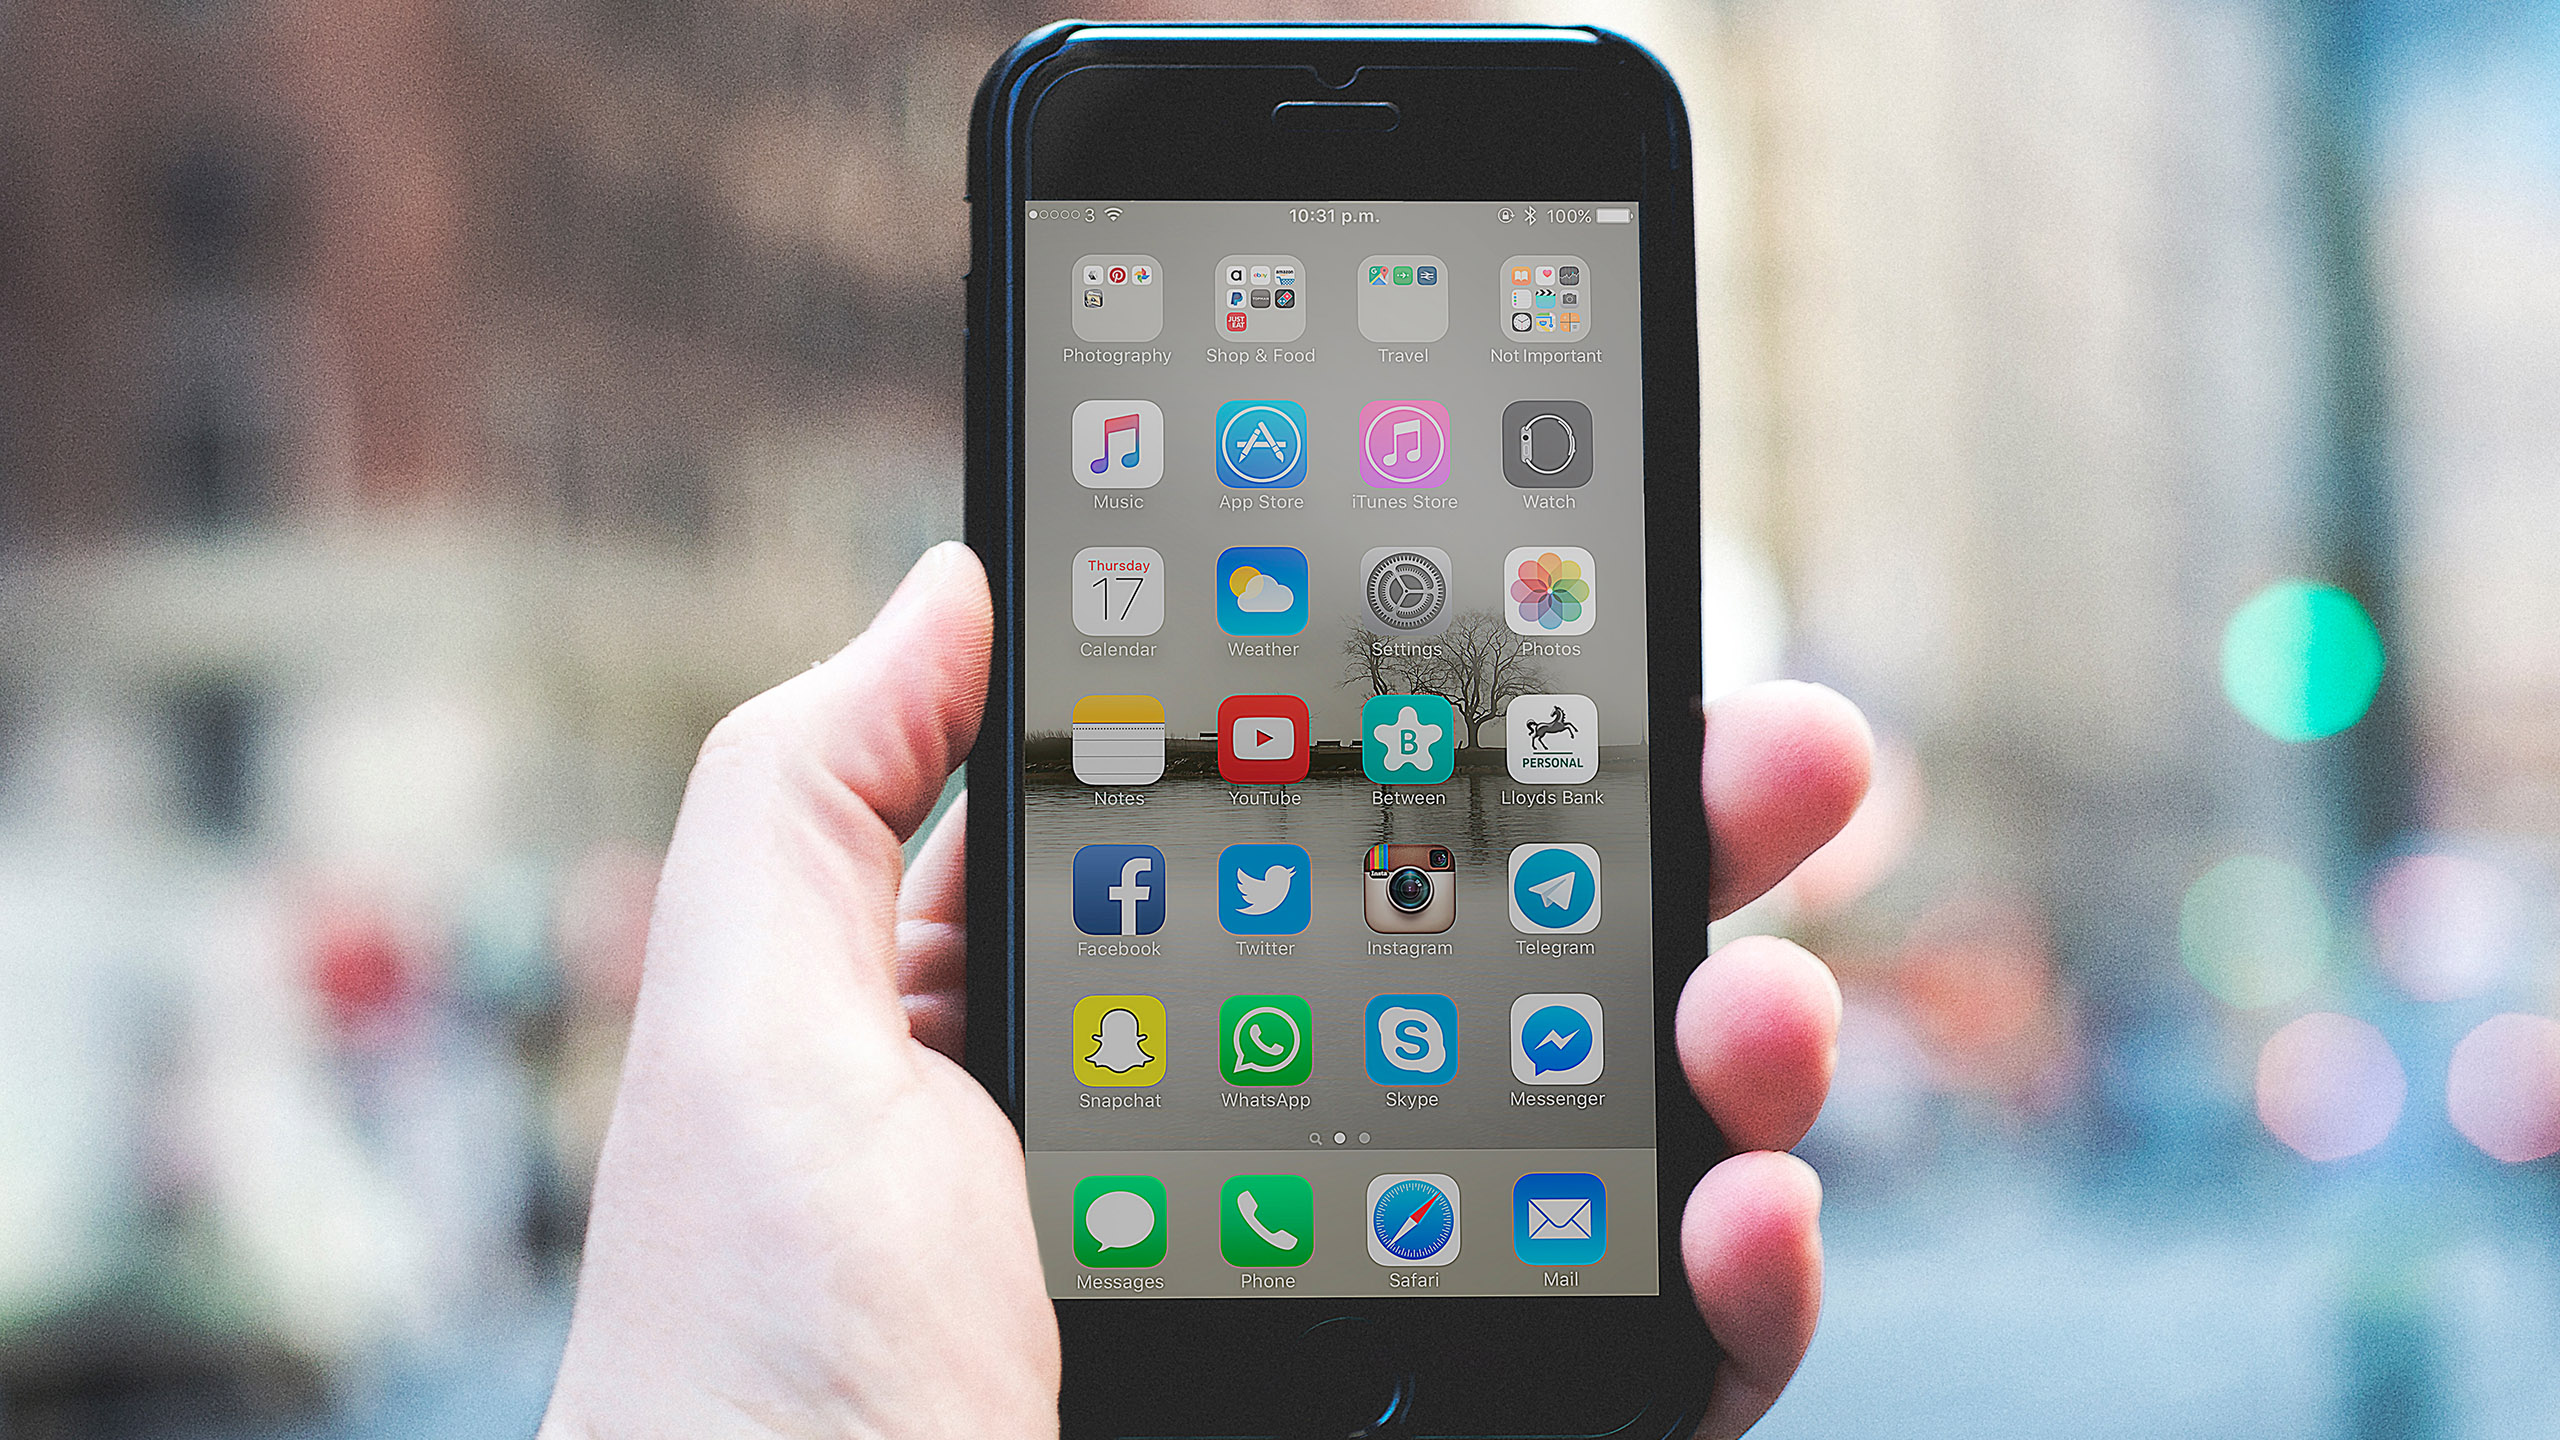 apps, viajeros, smartphone, celular